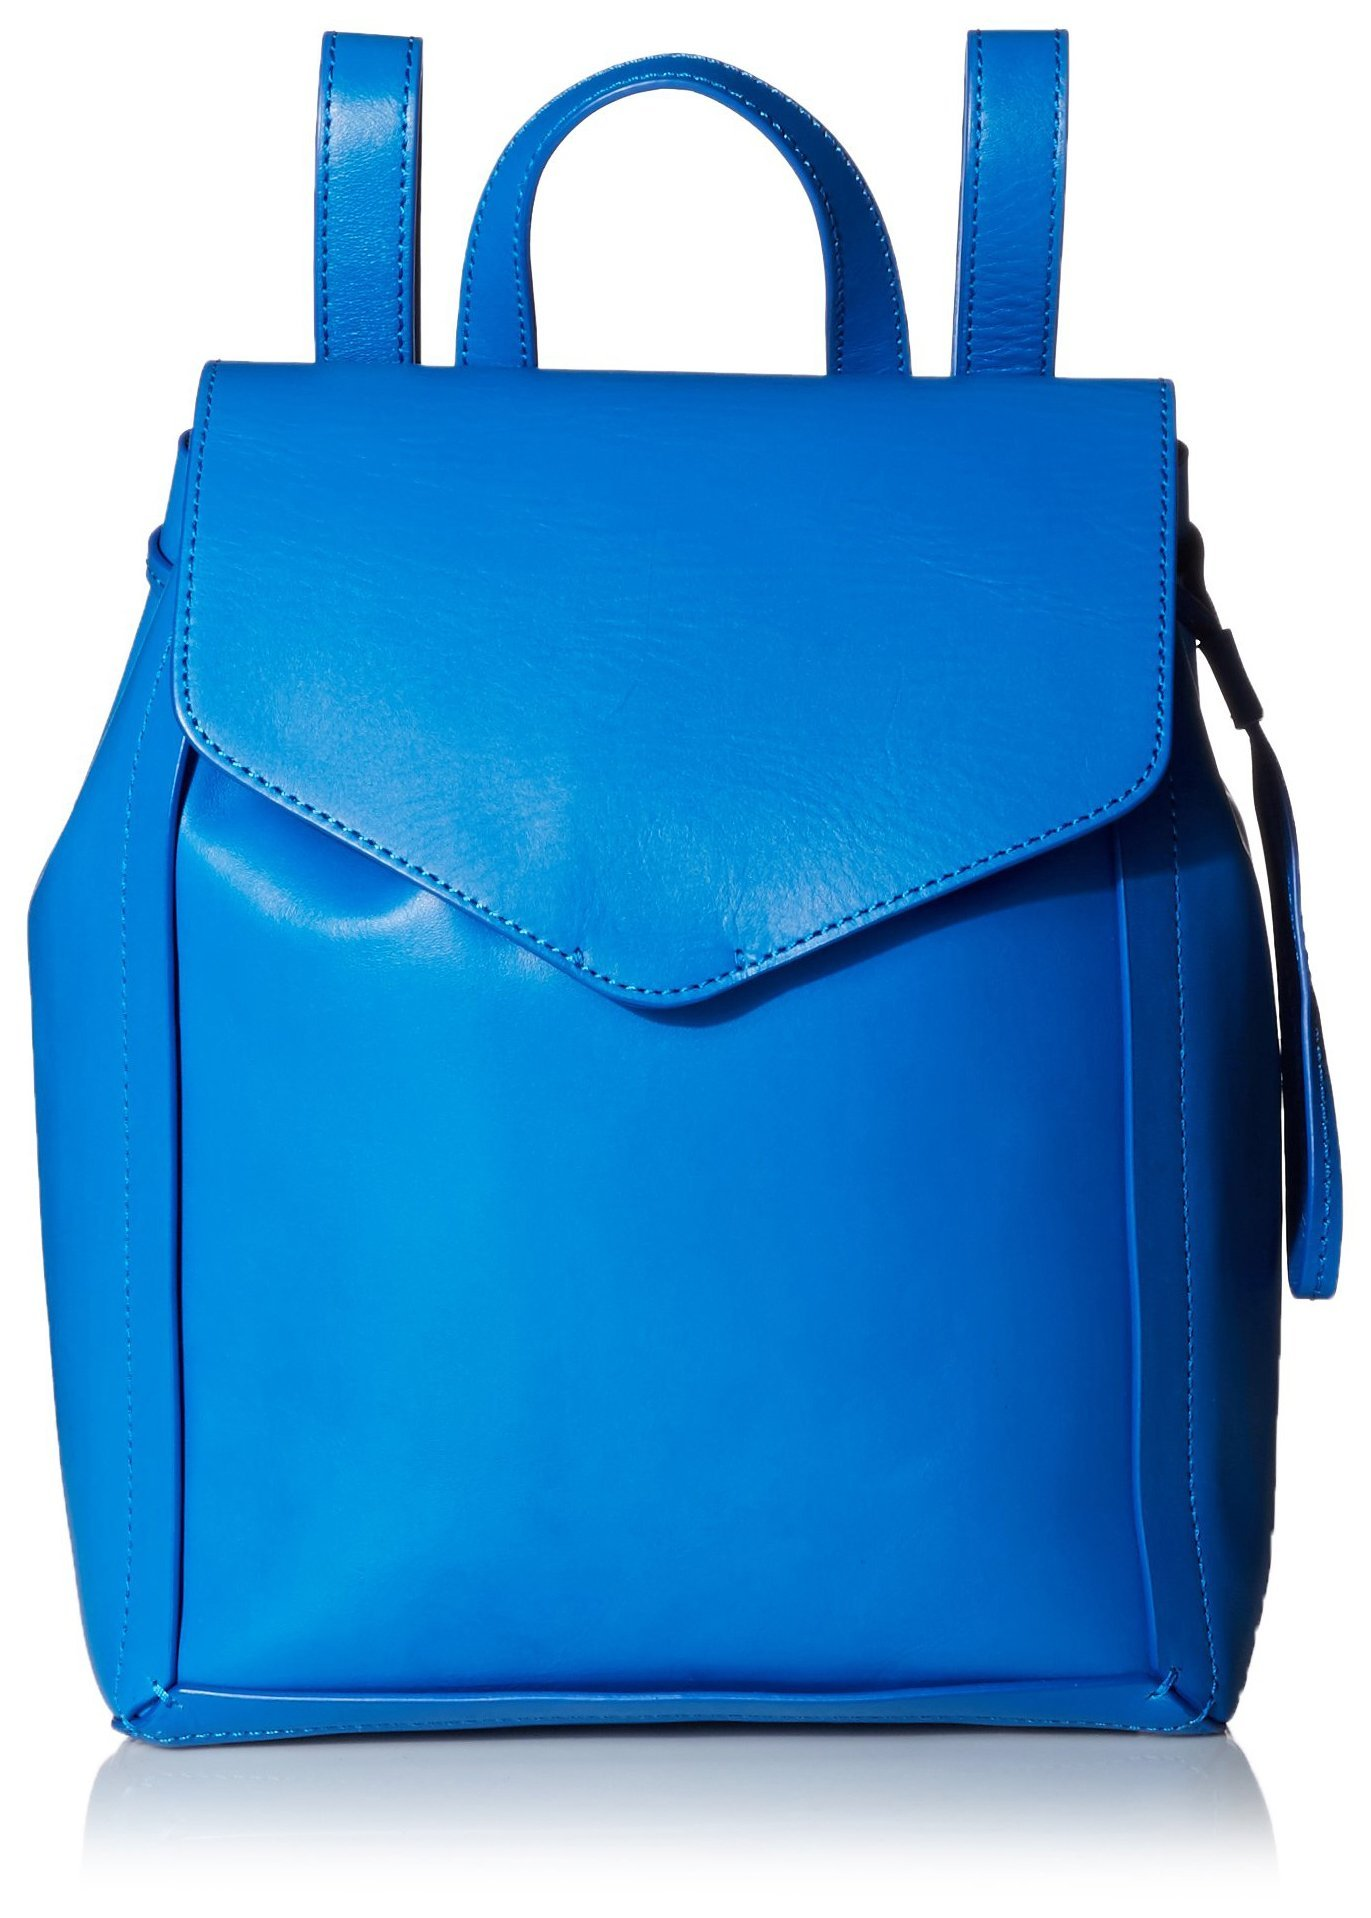 Loeffler Randall Women's Small Drawstring Back pack, Electric Blue by Loeffler Randall